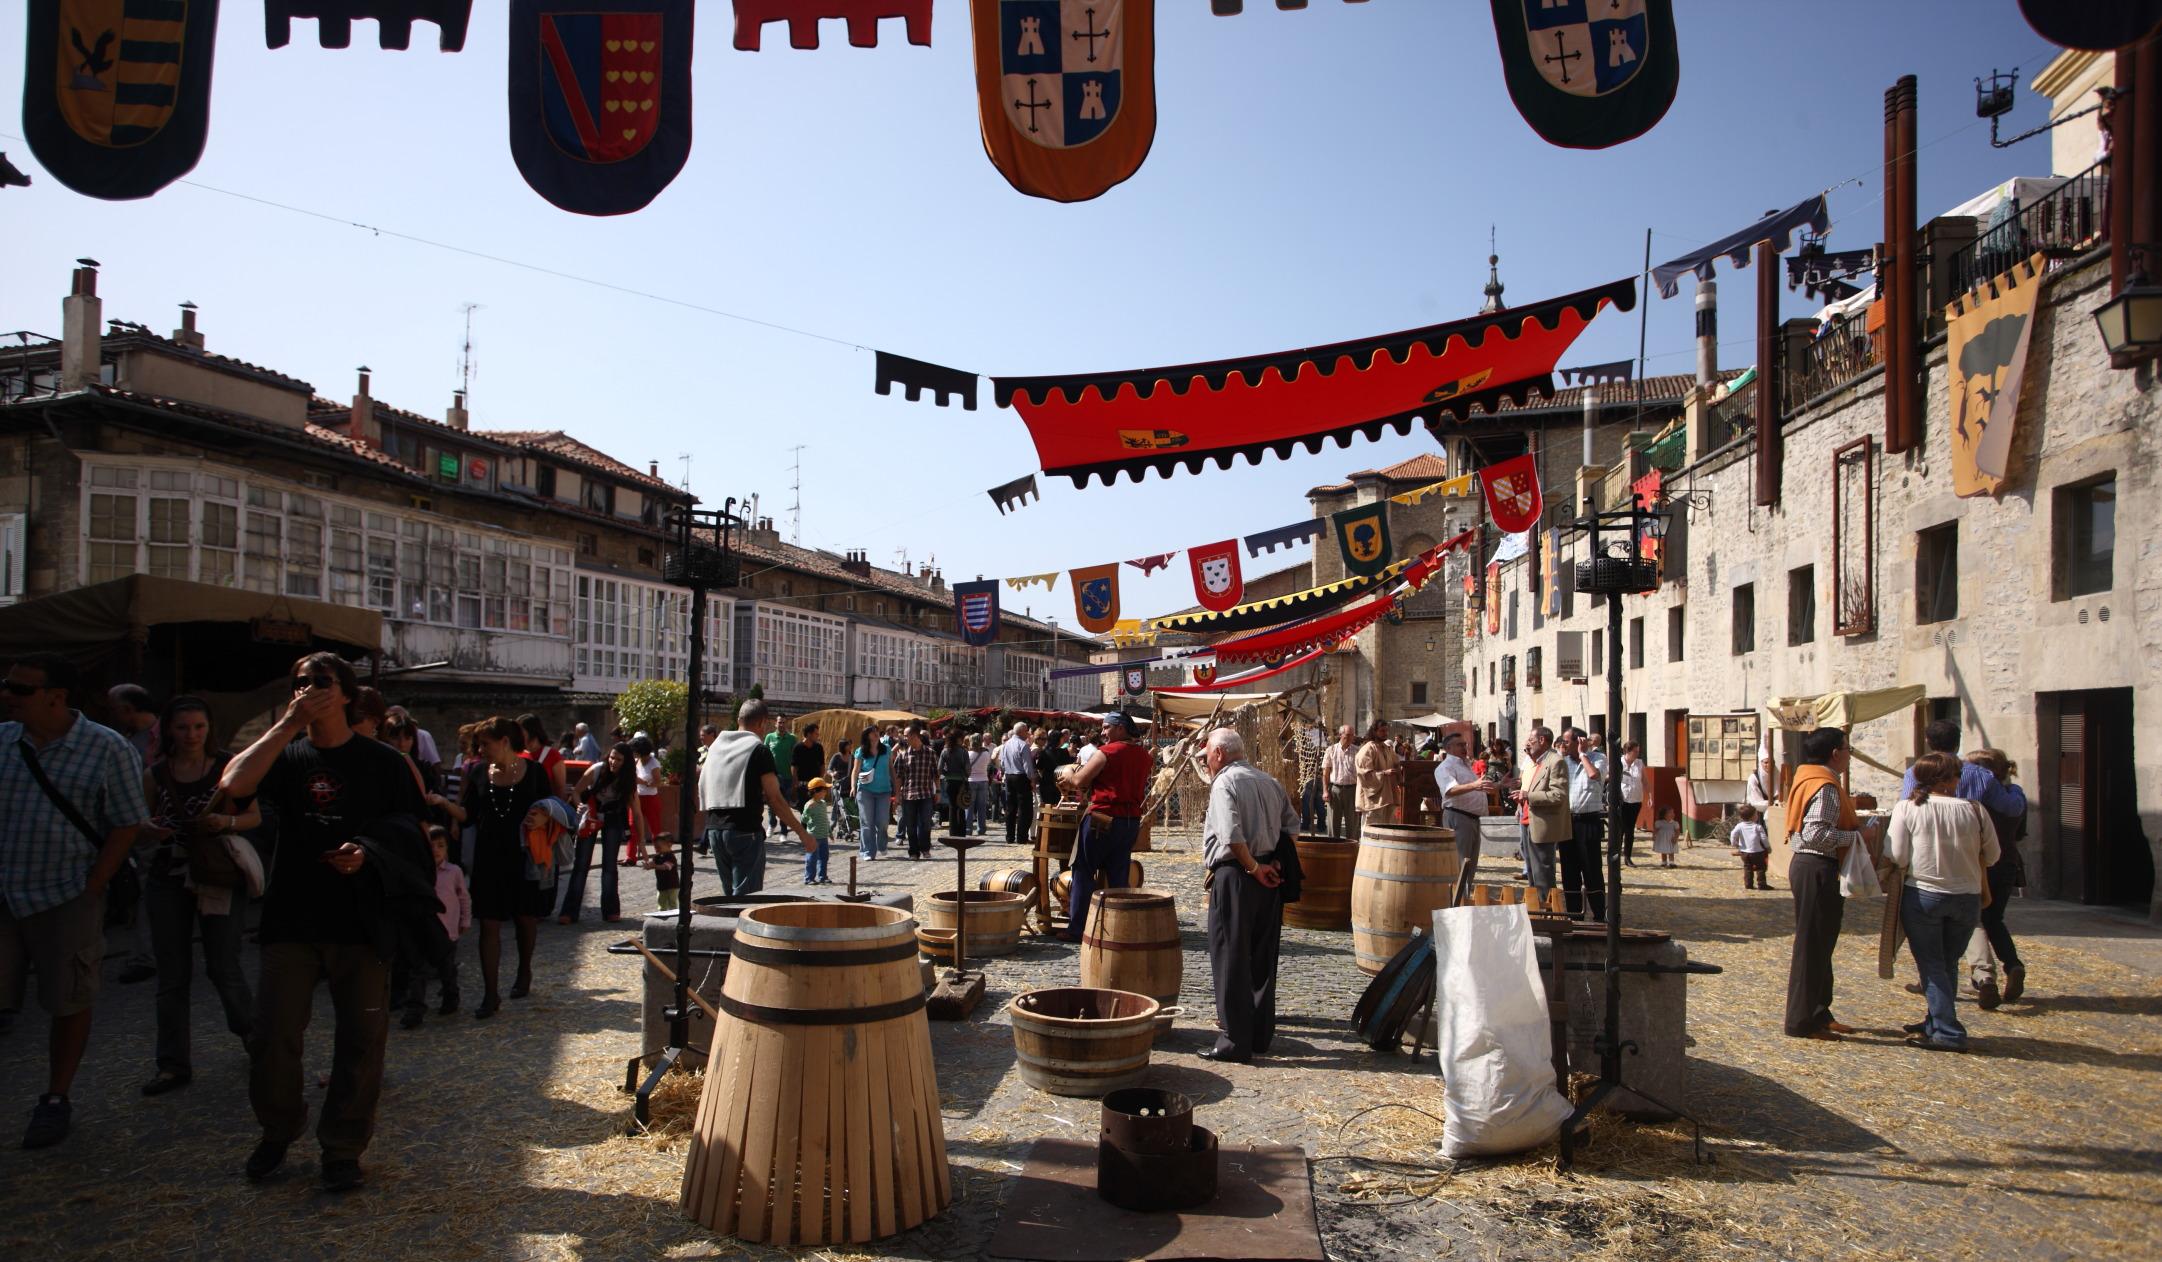 Mercado Medieval de Vitoria Gasteiz - Hotel Dato